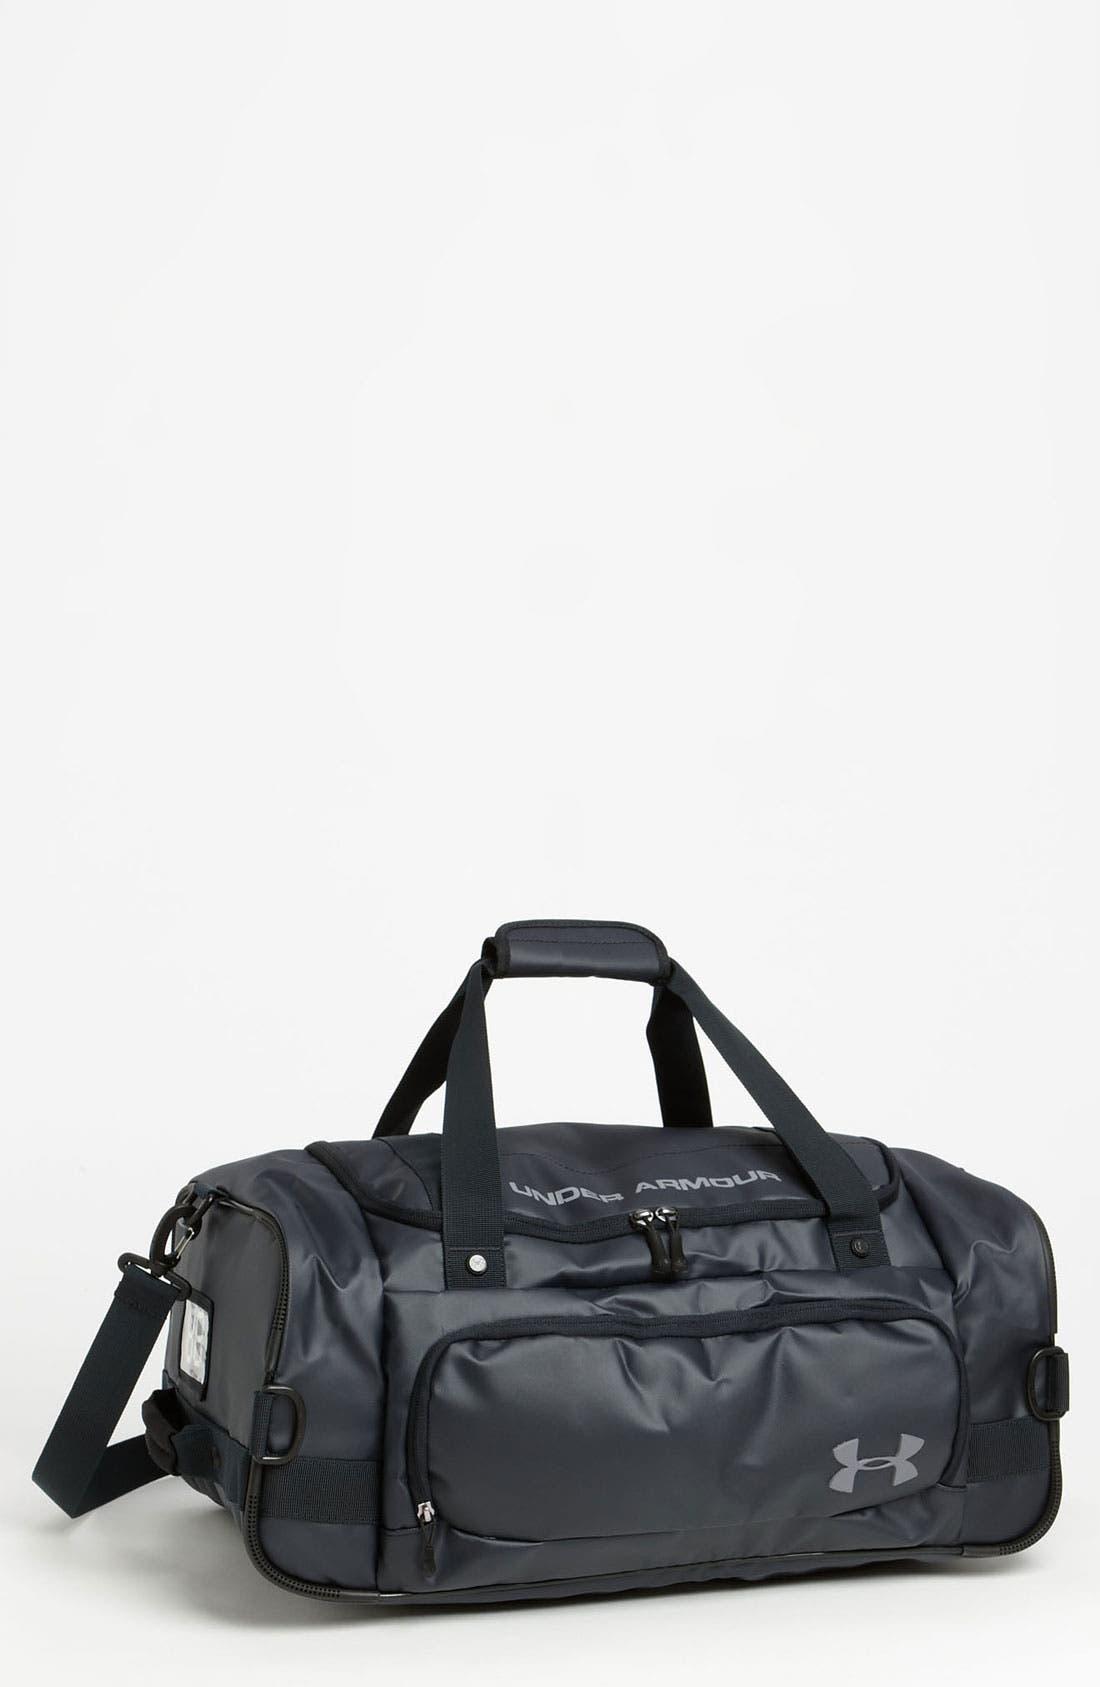 Main Image - Under Armour 'Storm' Duffel Bag